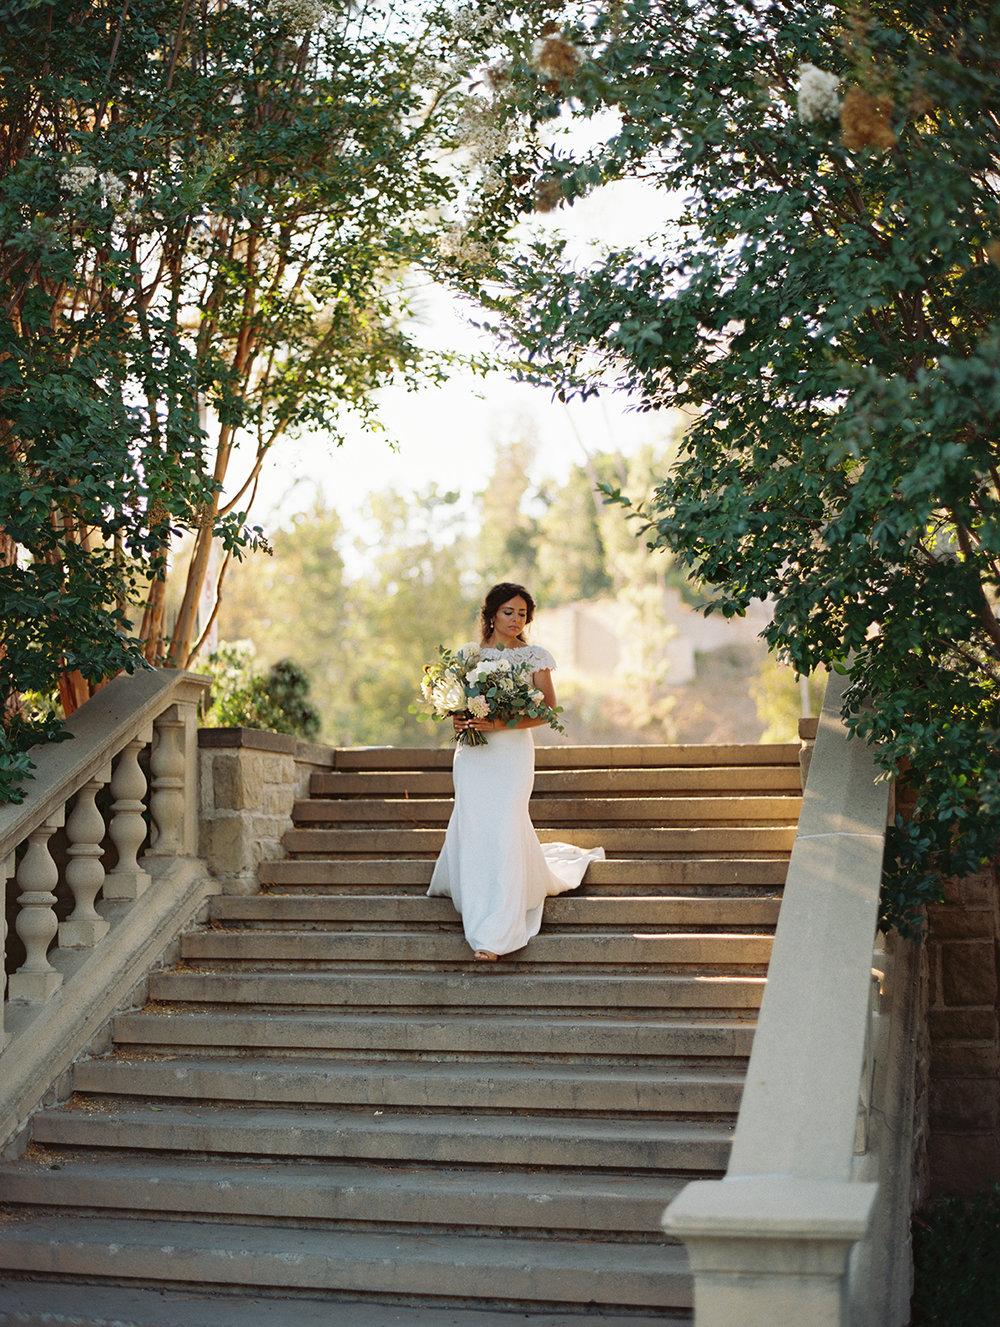 109-brian-sarra-los-angeles-wedding-brumley-wells-photography.jpg